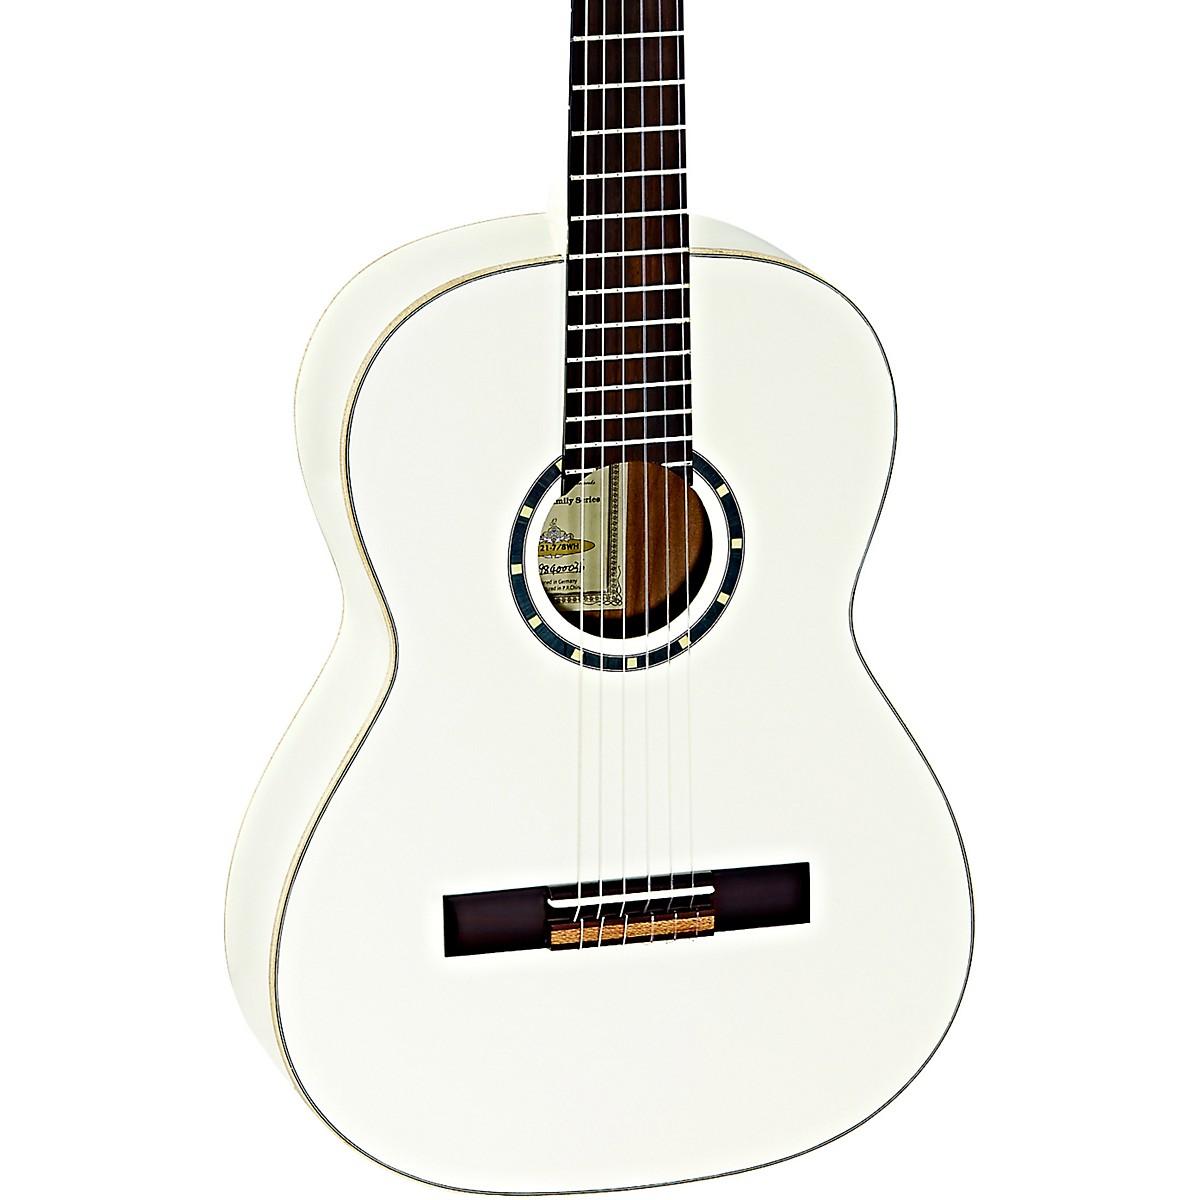 Ortega Family Series R121-7/8WH 7/8 Size Classical Guitar